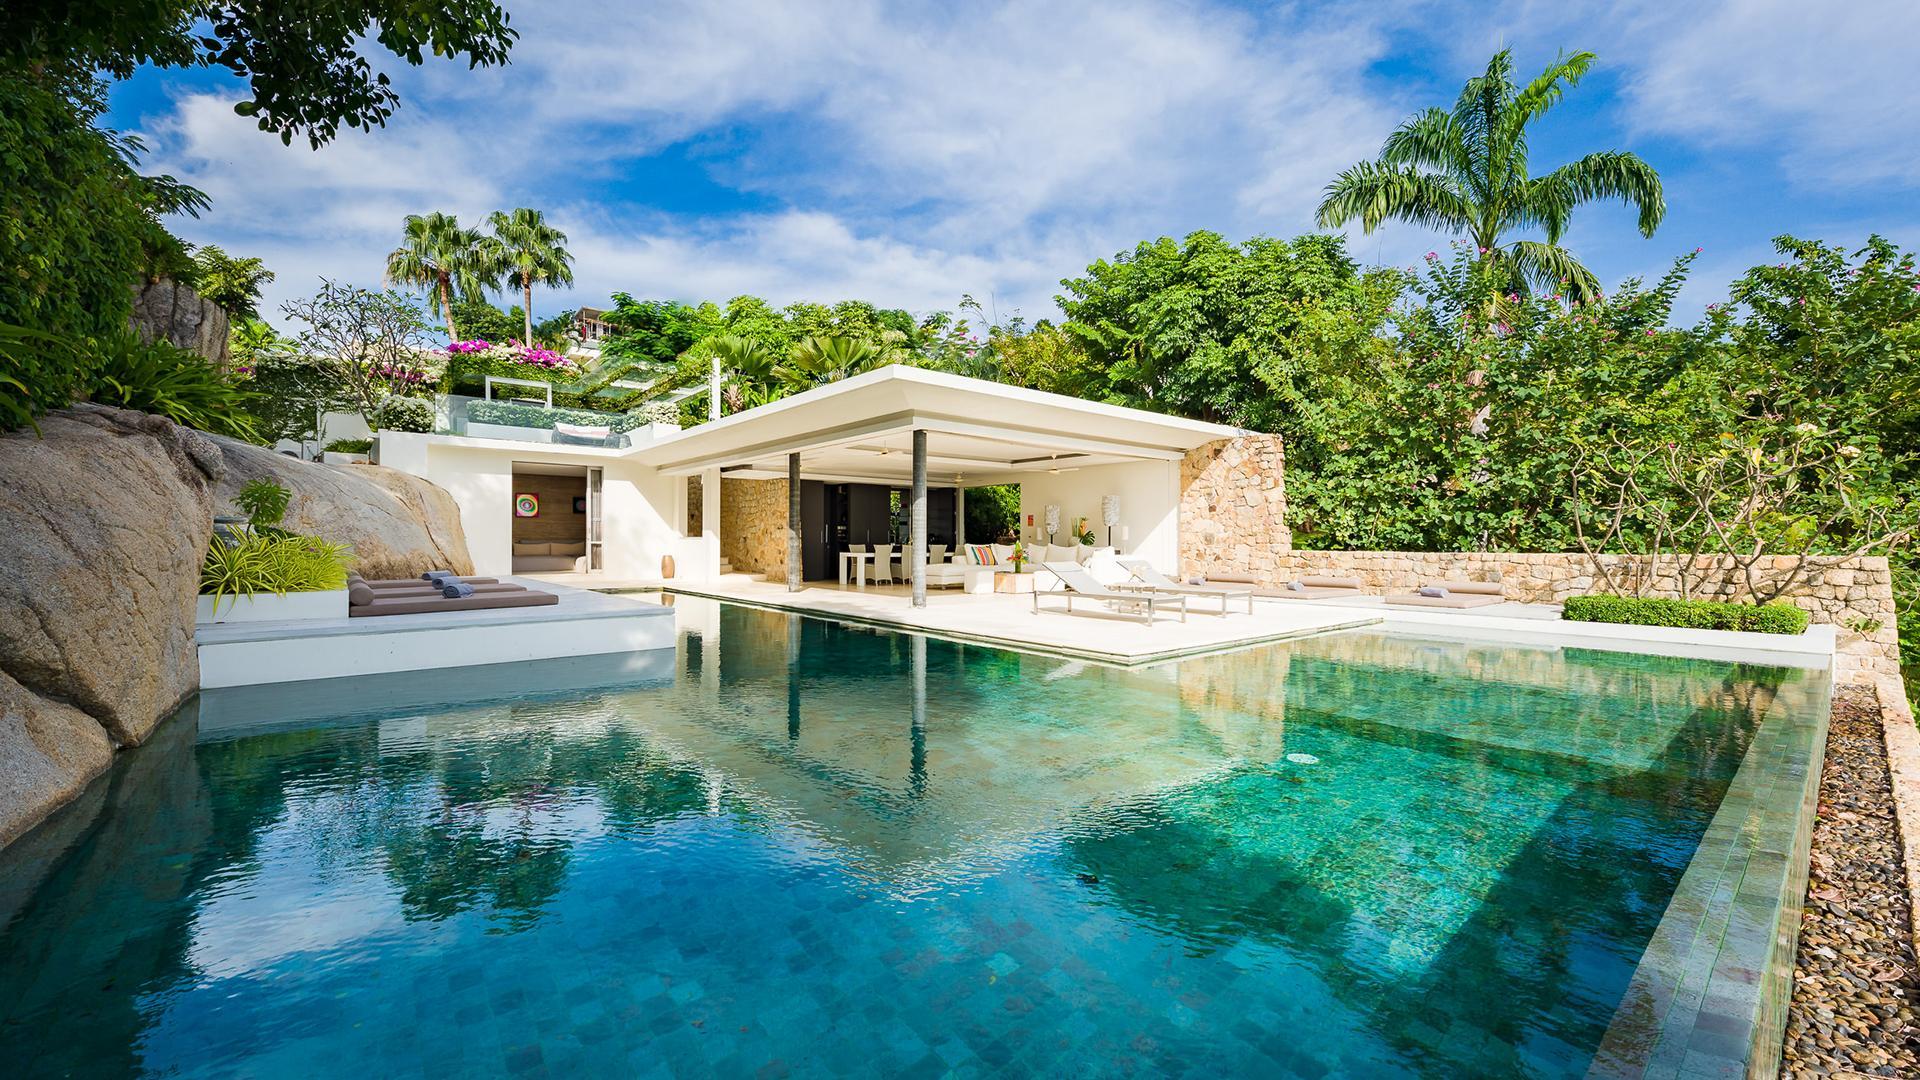 Three-Bedroom Villa image 1 at Samujana Villas by Amphoe Ko Samui, Surat Thani, Thailand